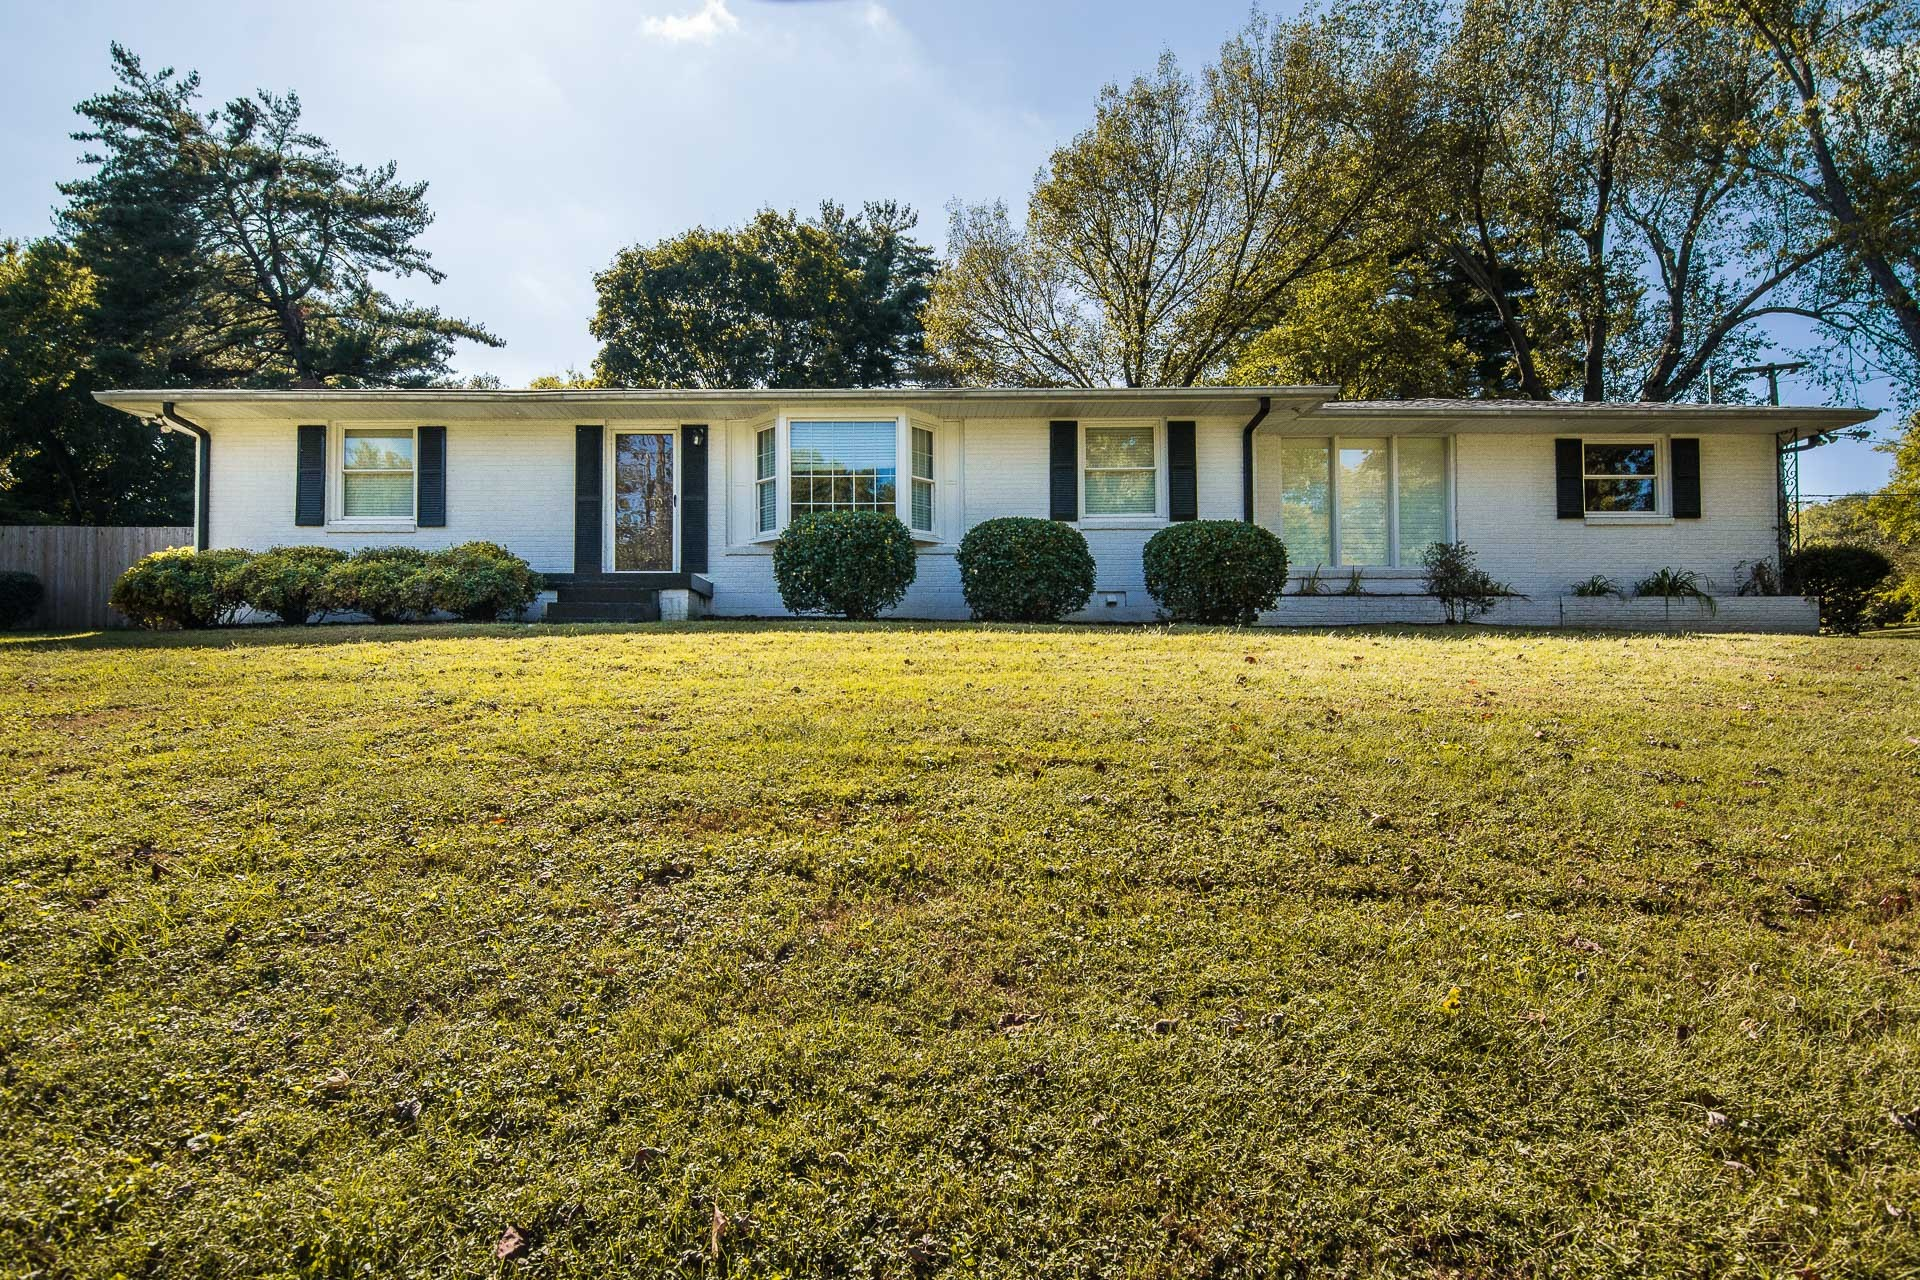 301 Bramblewood Dr, Crieve Hill, Tennessee